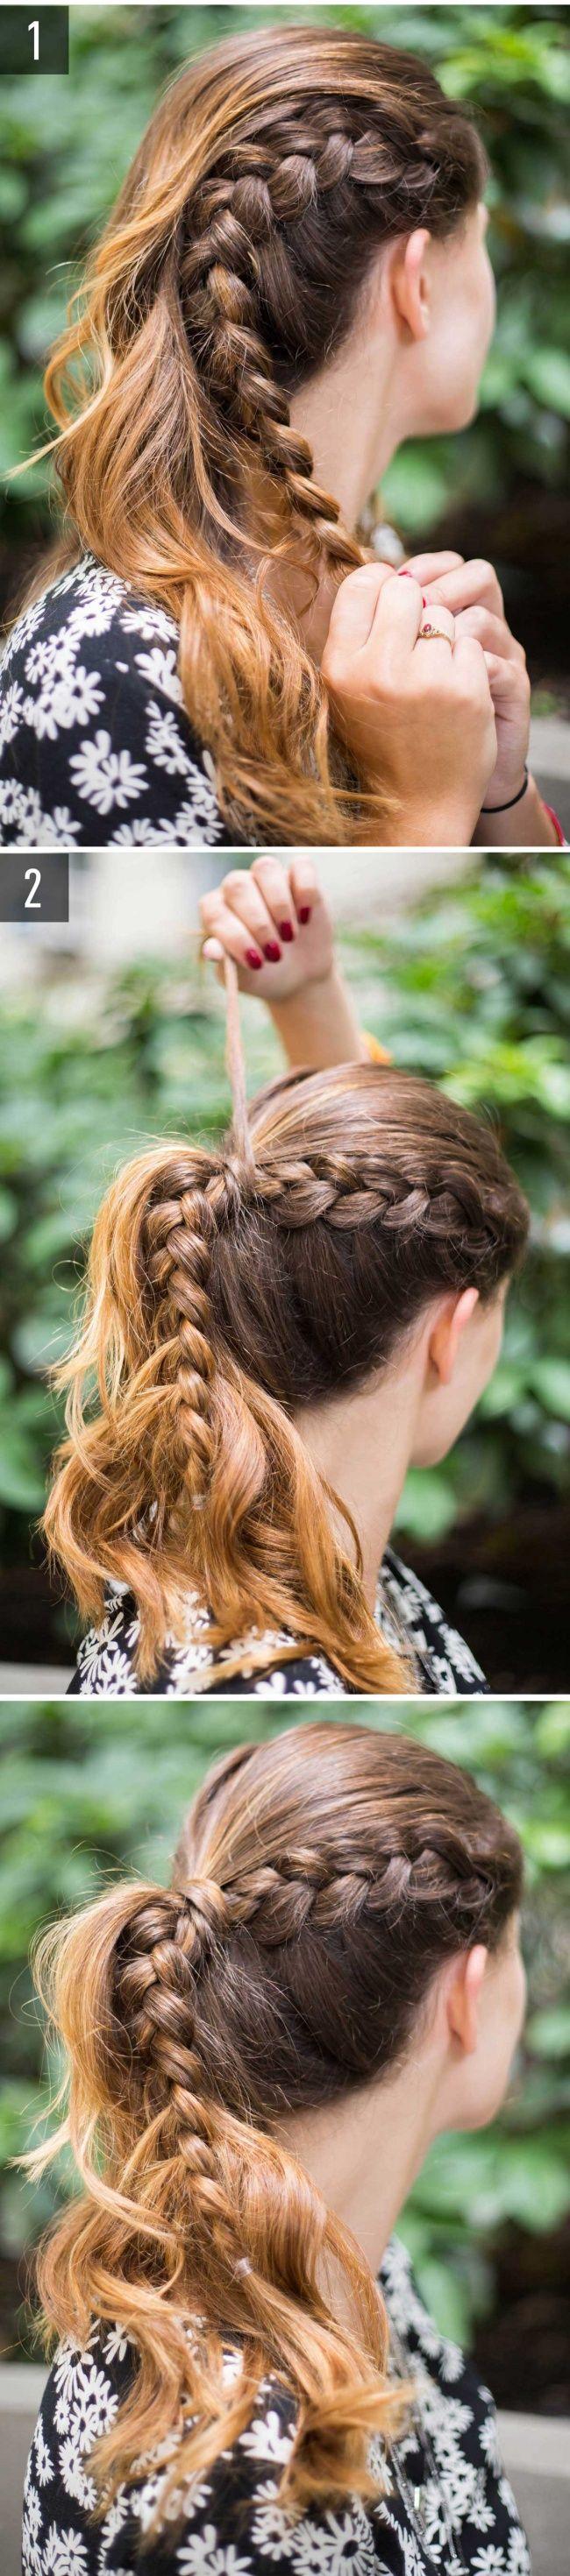 maneras de peinarte si se te está haciendo tarde hair style